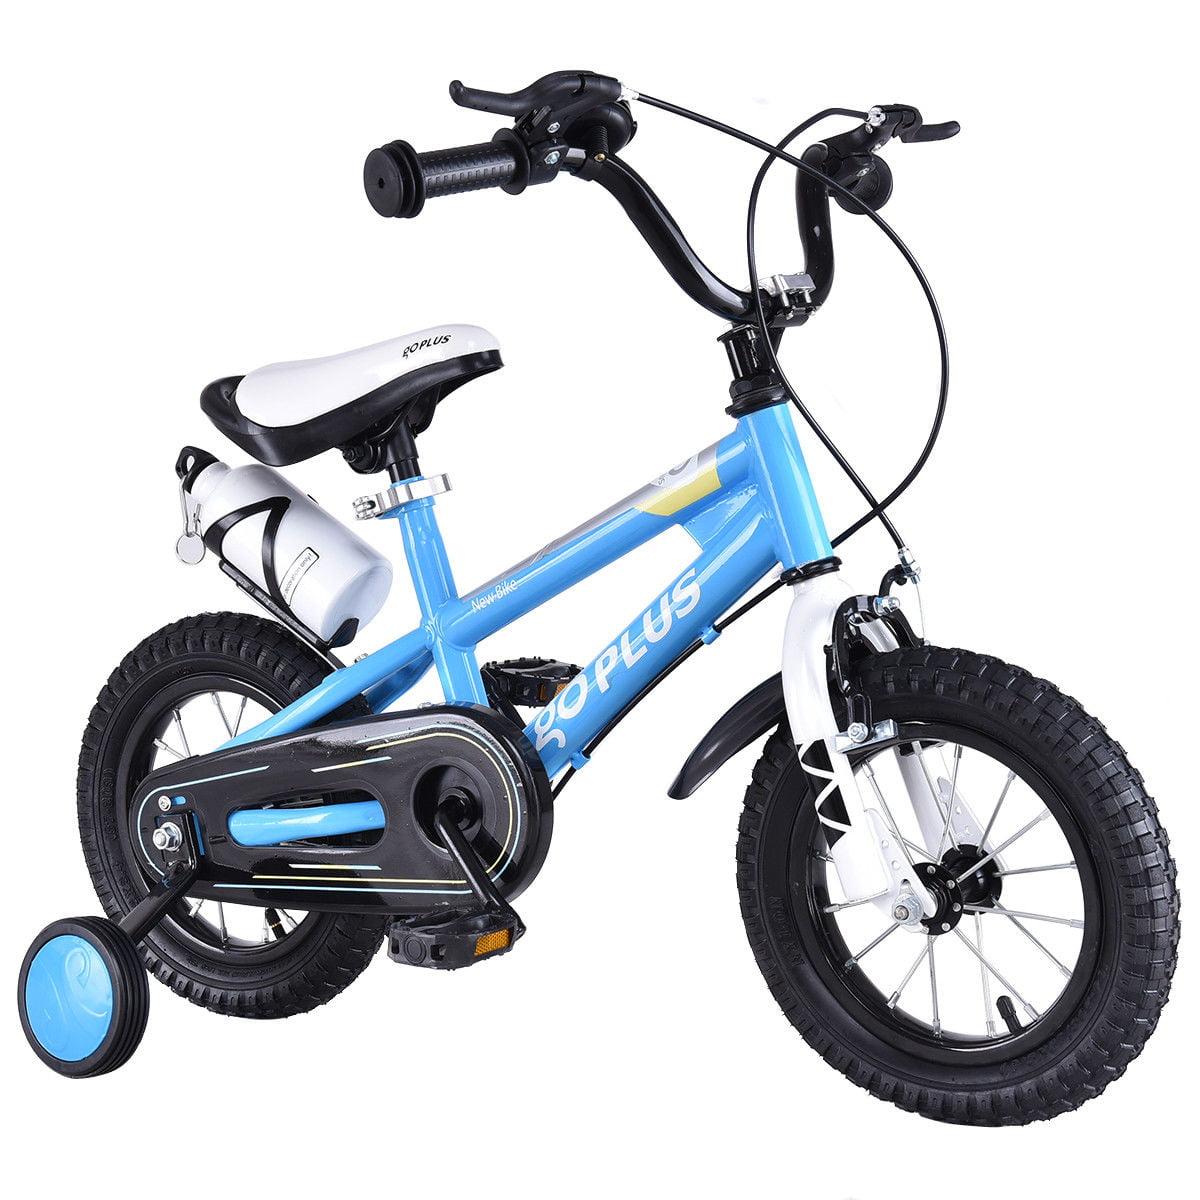 "Goplus 12"" Freestyle Kids Bike Bicycle Children Boys & Girls w Training Wheels Blue by Goplus"